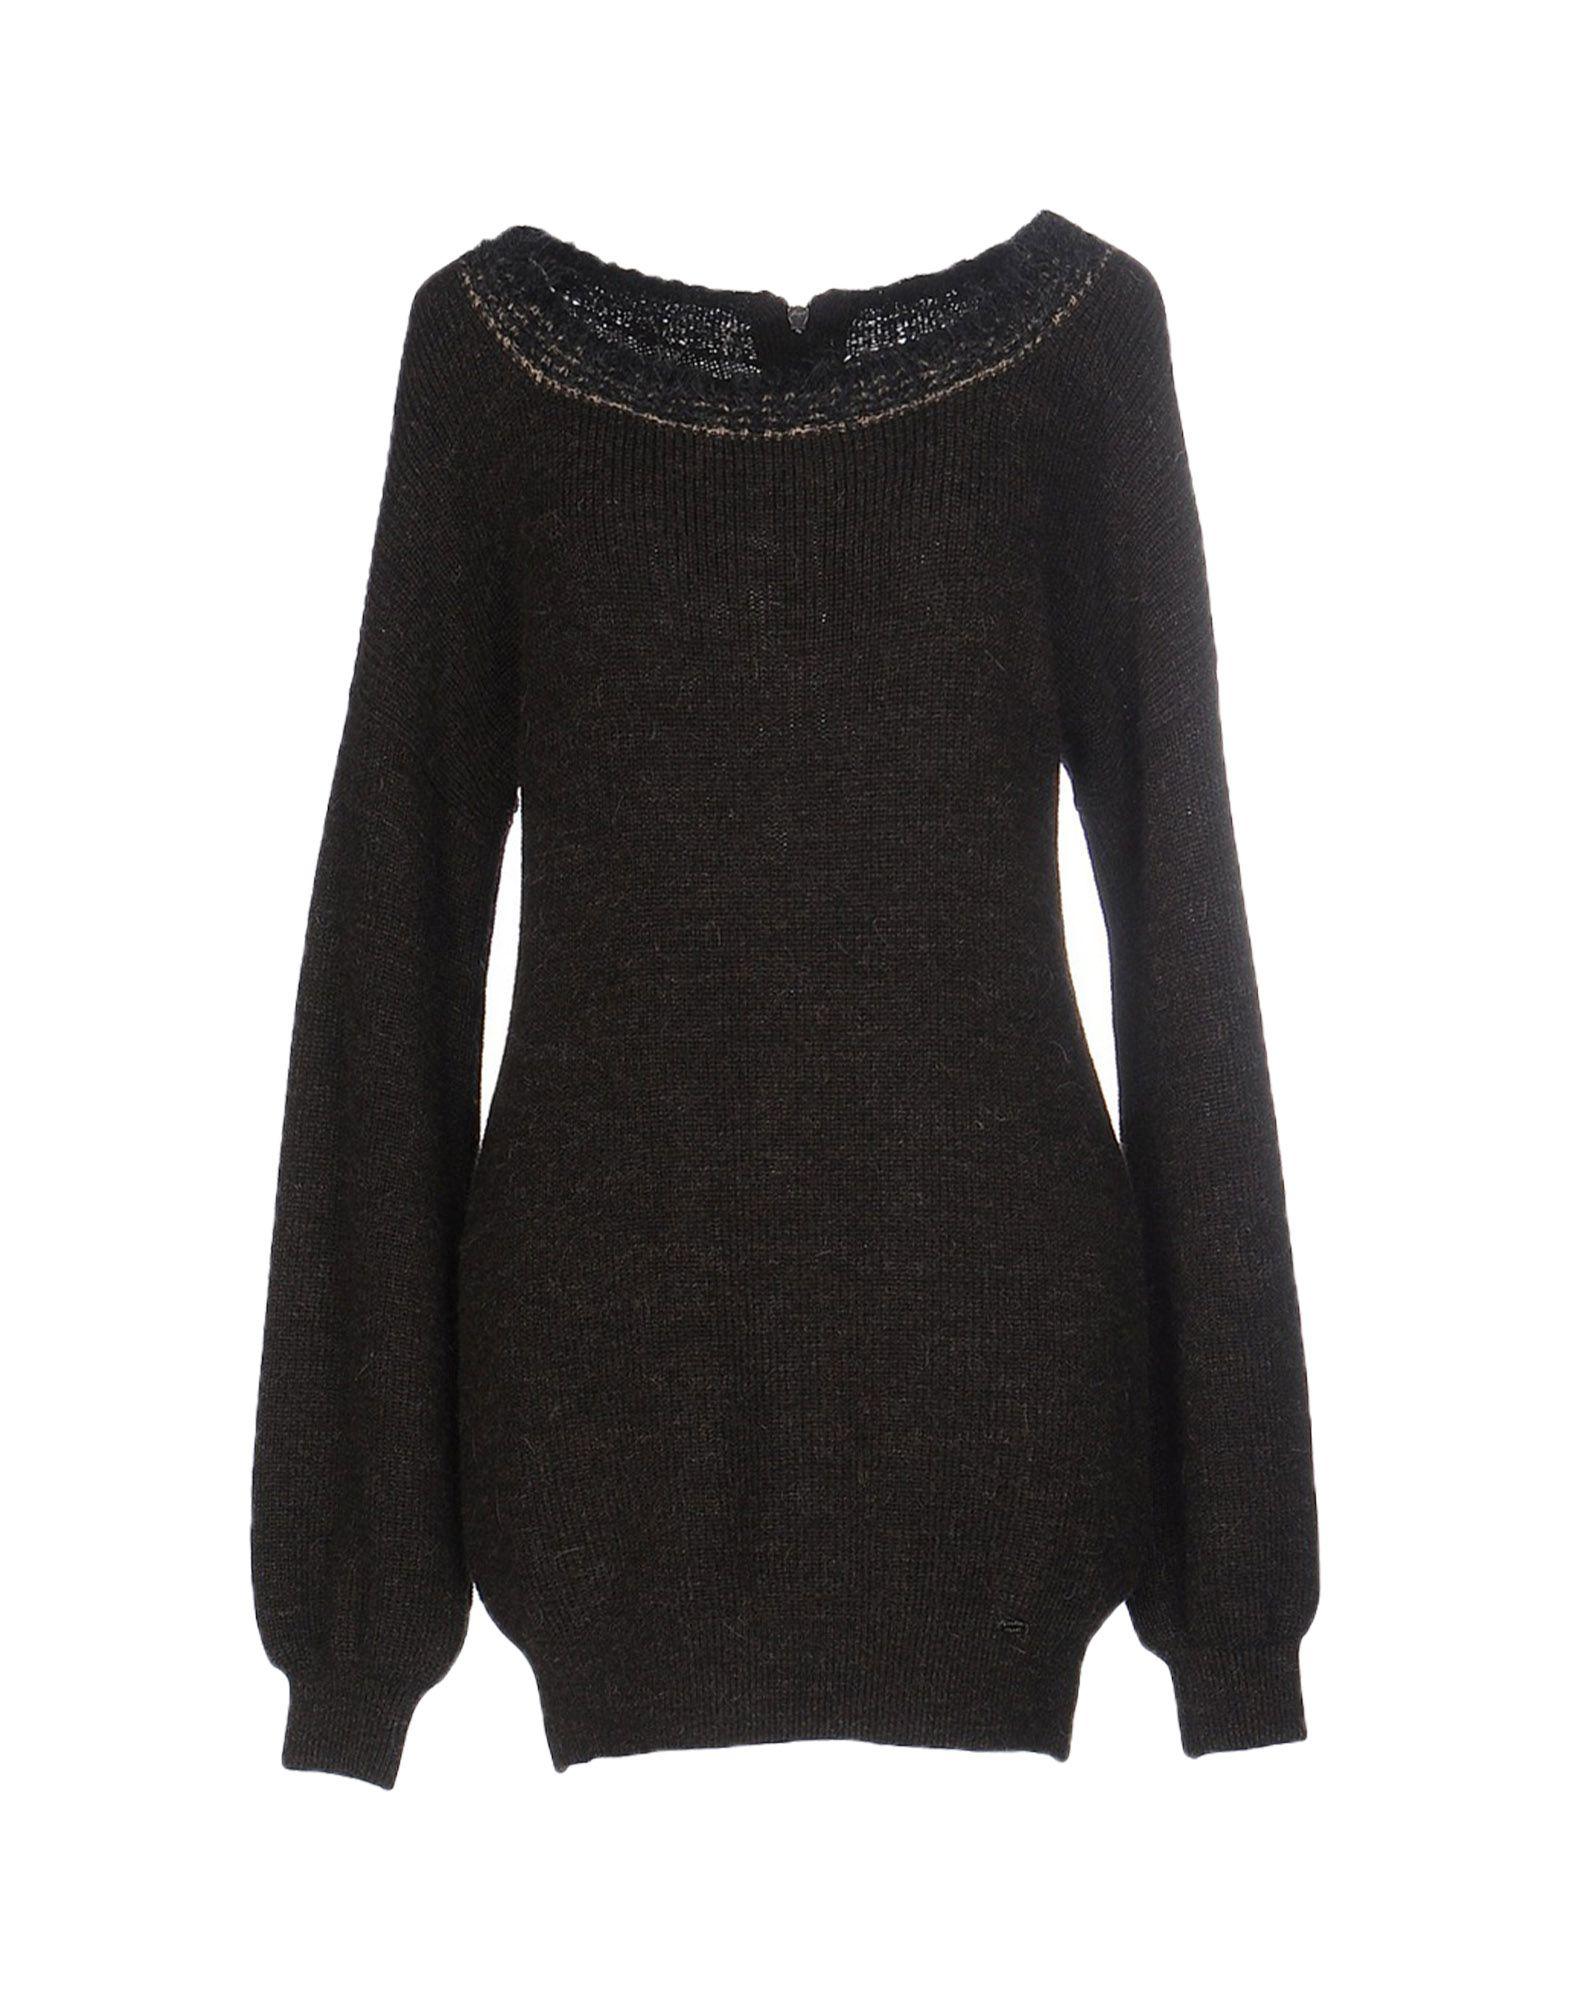 SCERVINO STREET Sweater in Dark Brown